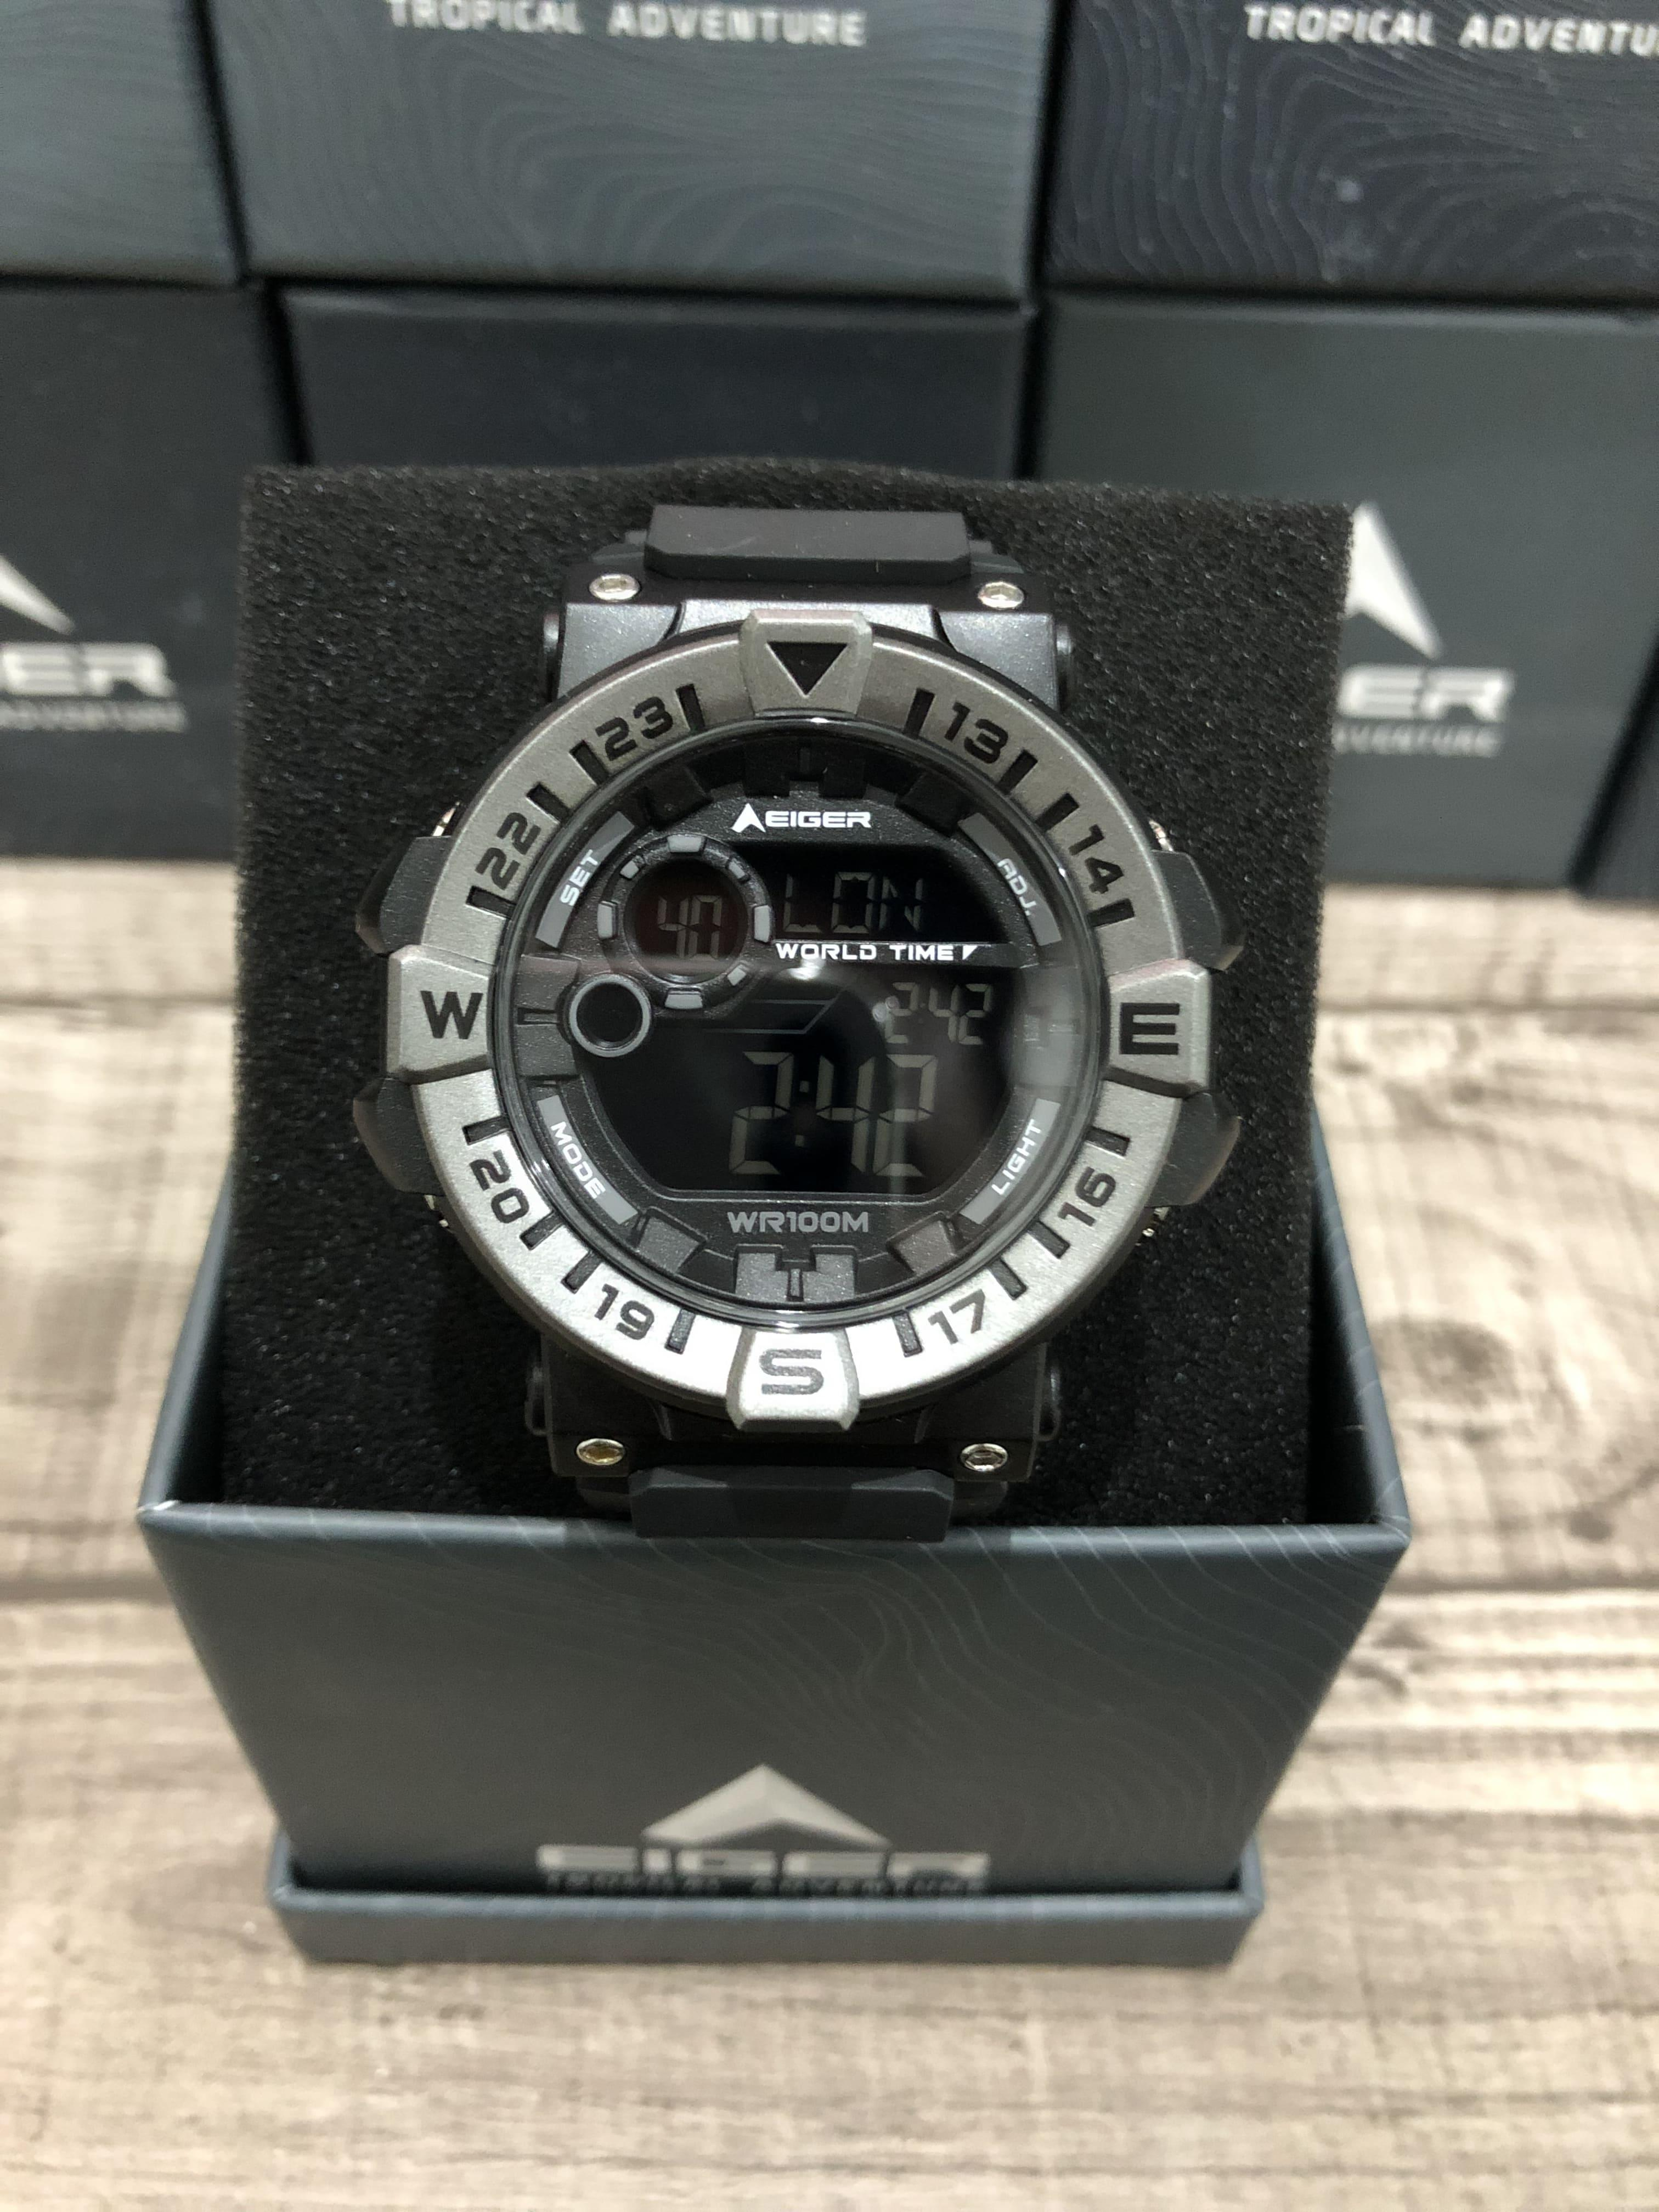 eiger Jam tangan 8290 leschaux black digital watch water resist 100M original produk